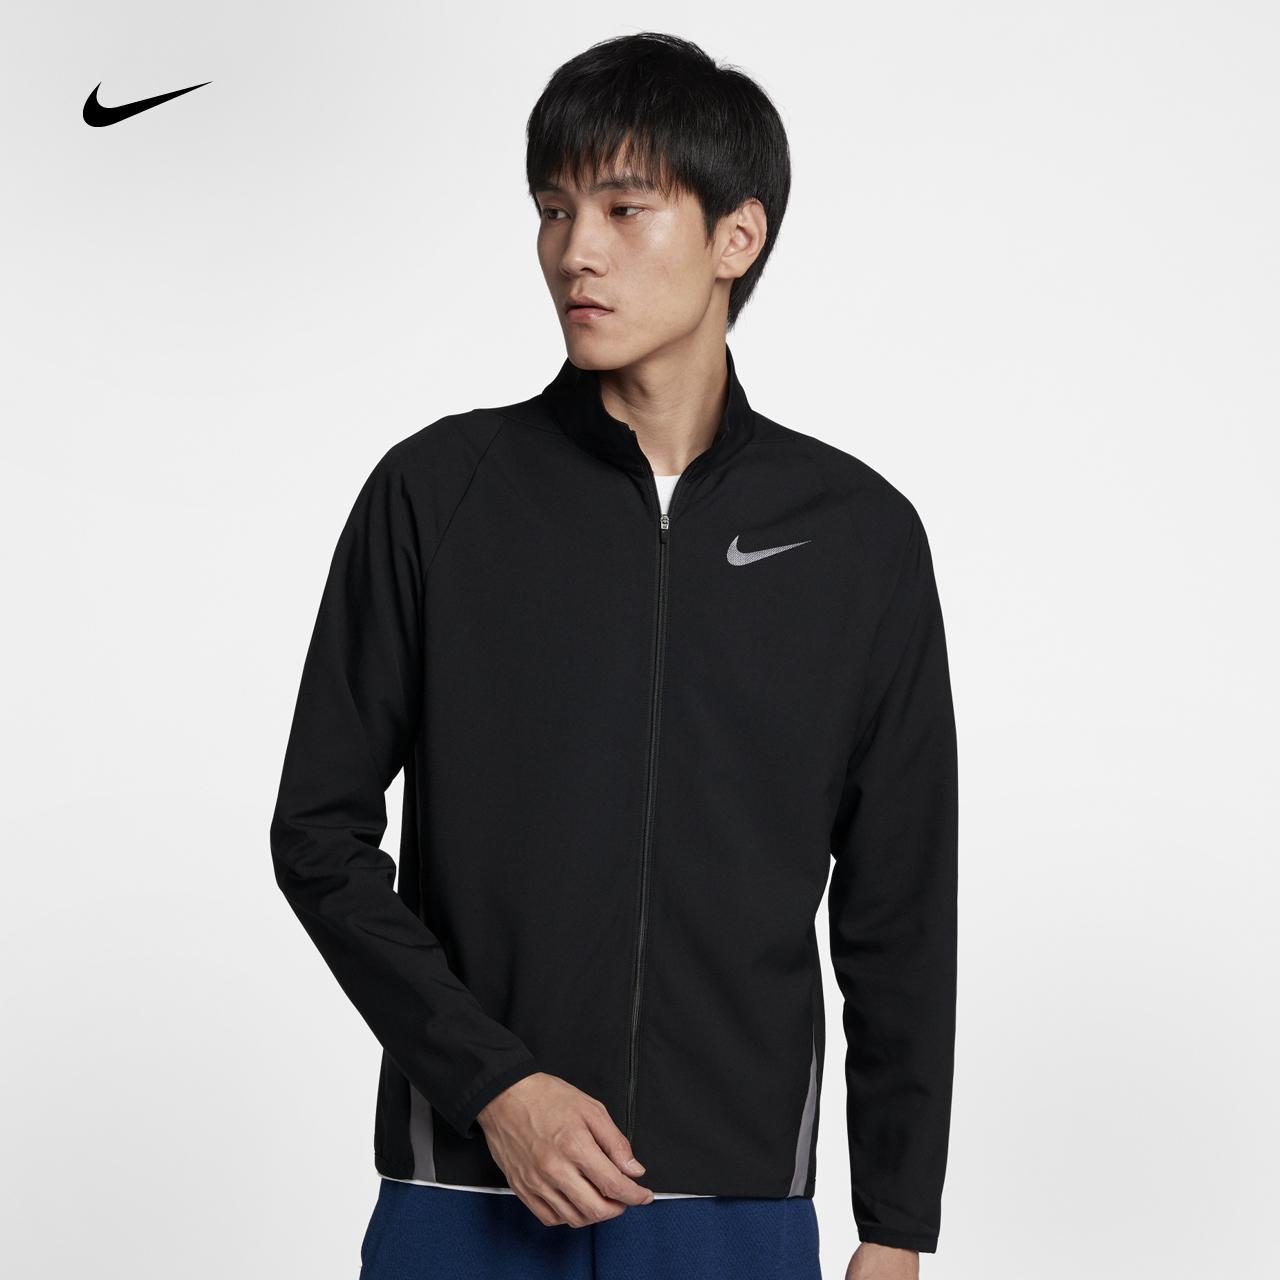 Nike耐克外套男秋季短款男子保暖运动夹克外套928011-01012月01日最新优惠